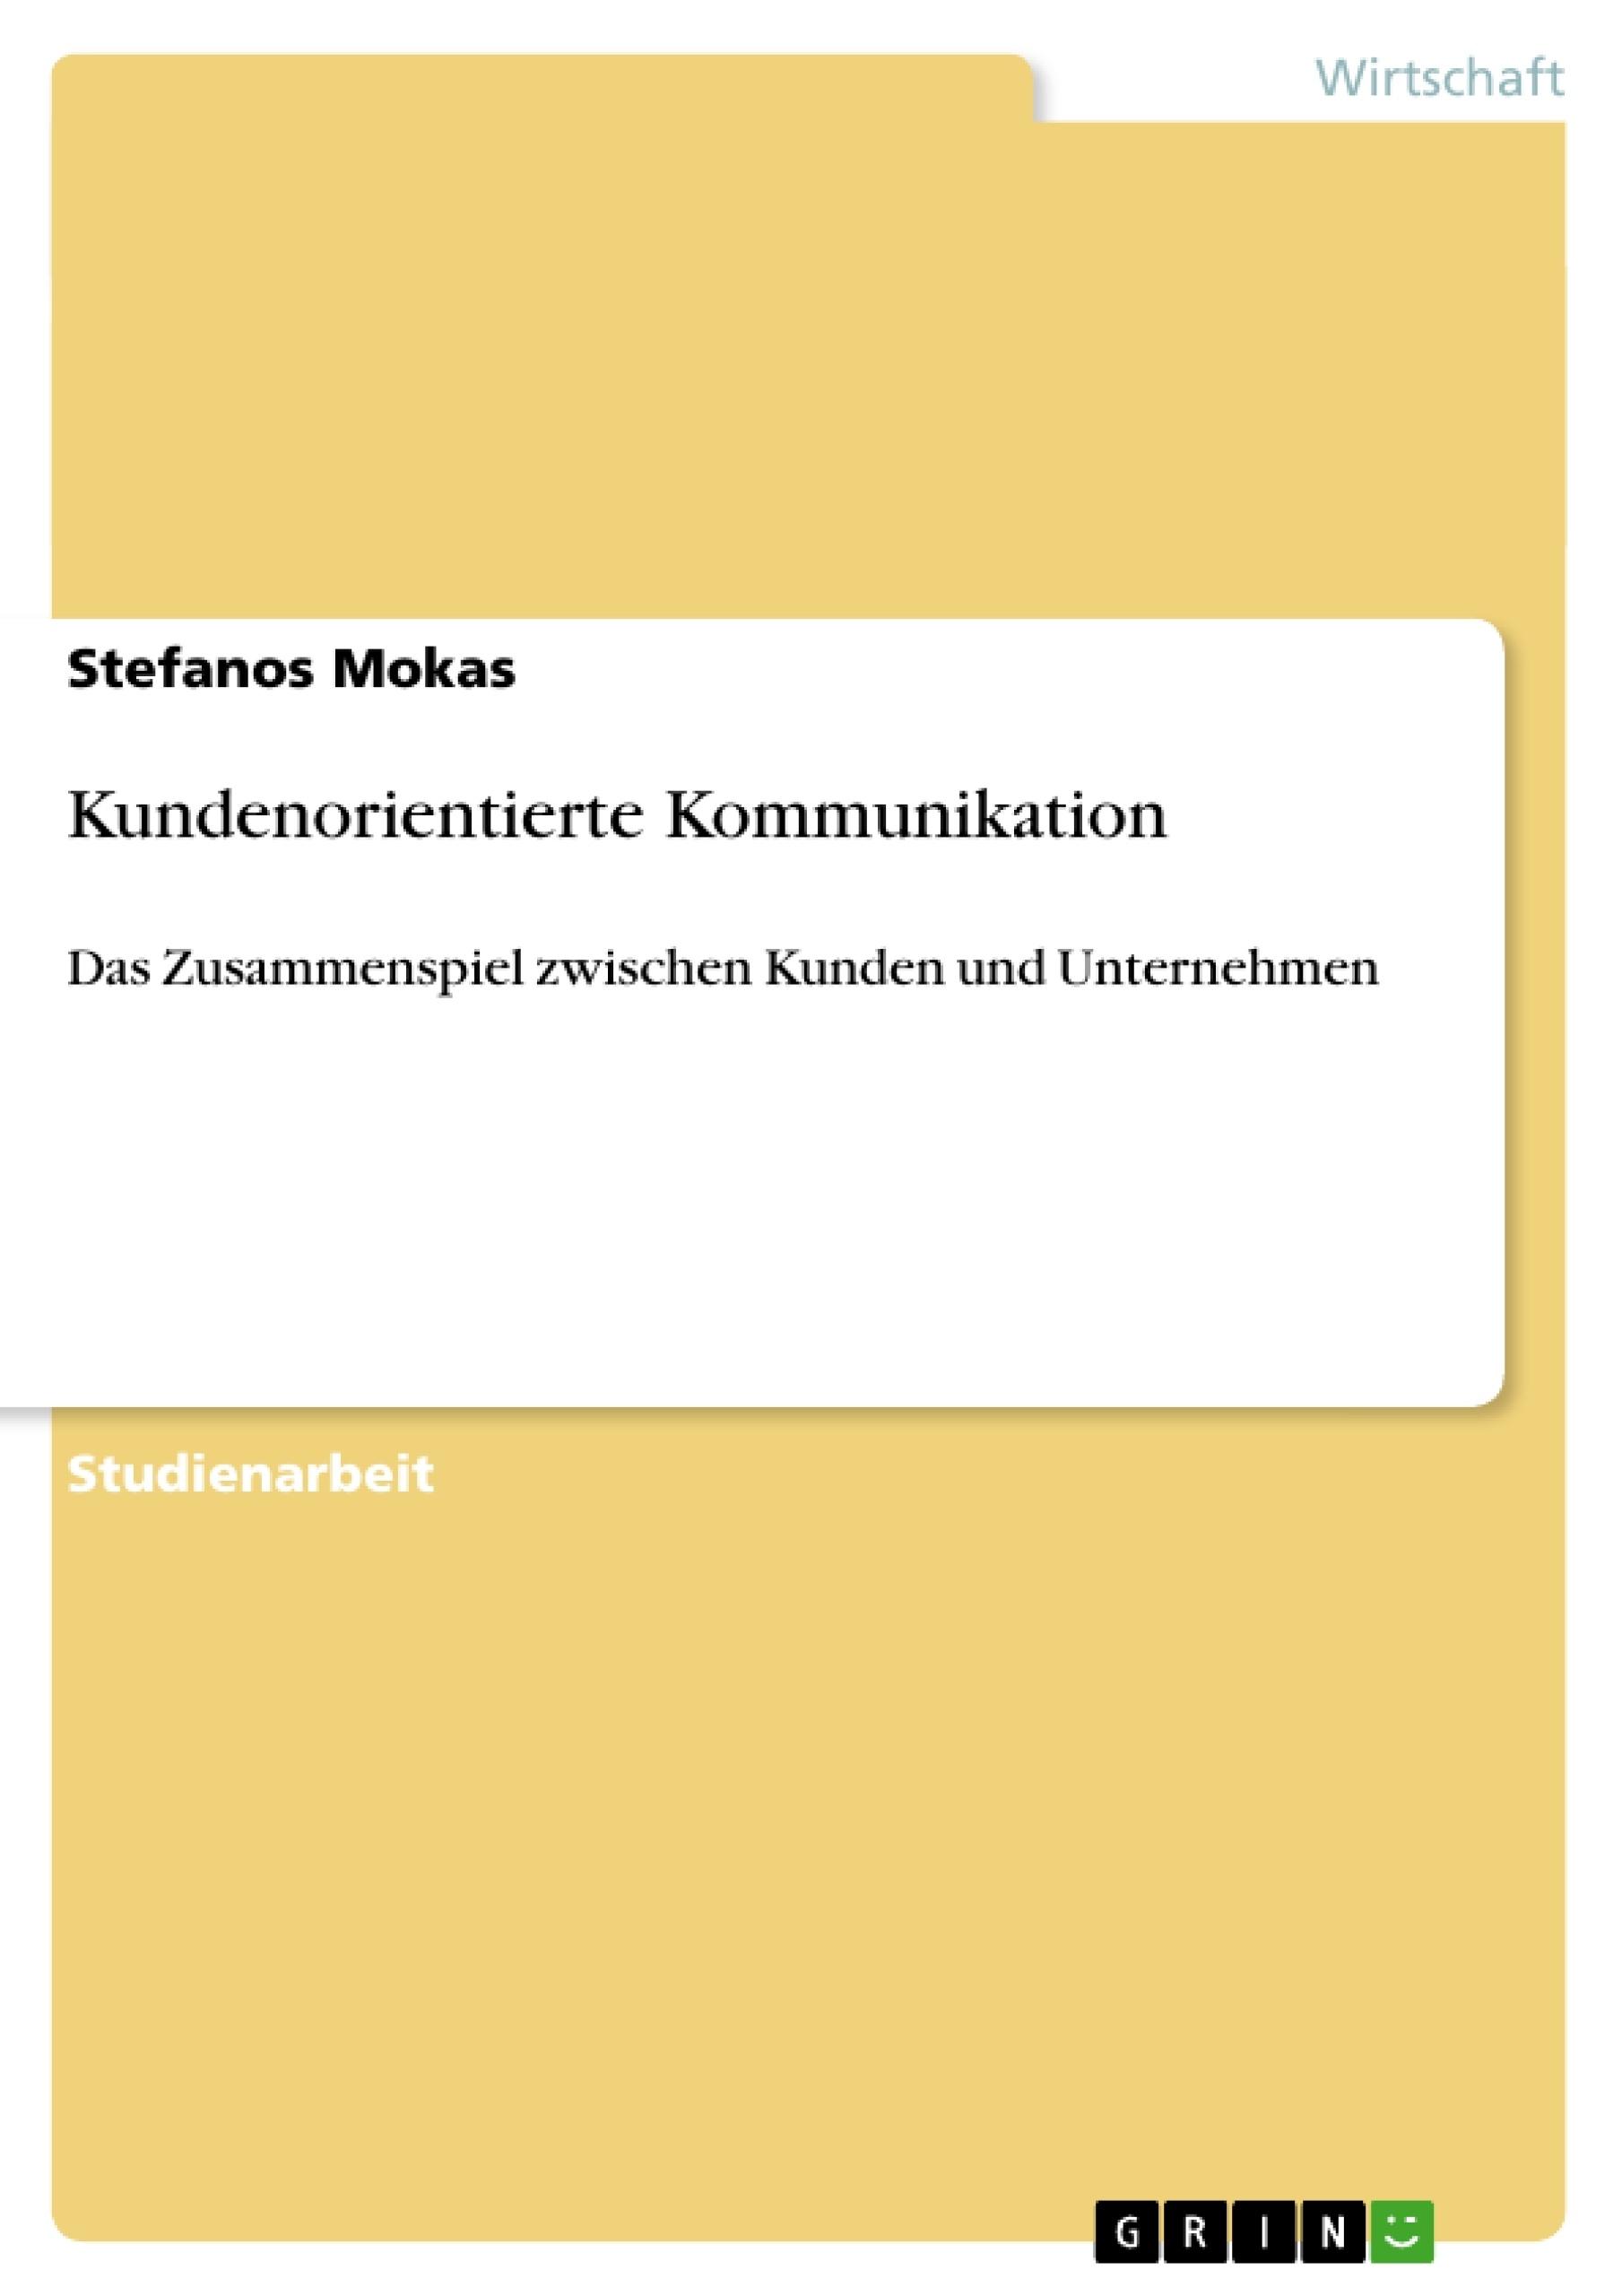 Titel: Kundenorientierte Kommunikation